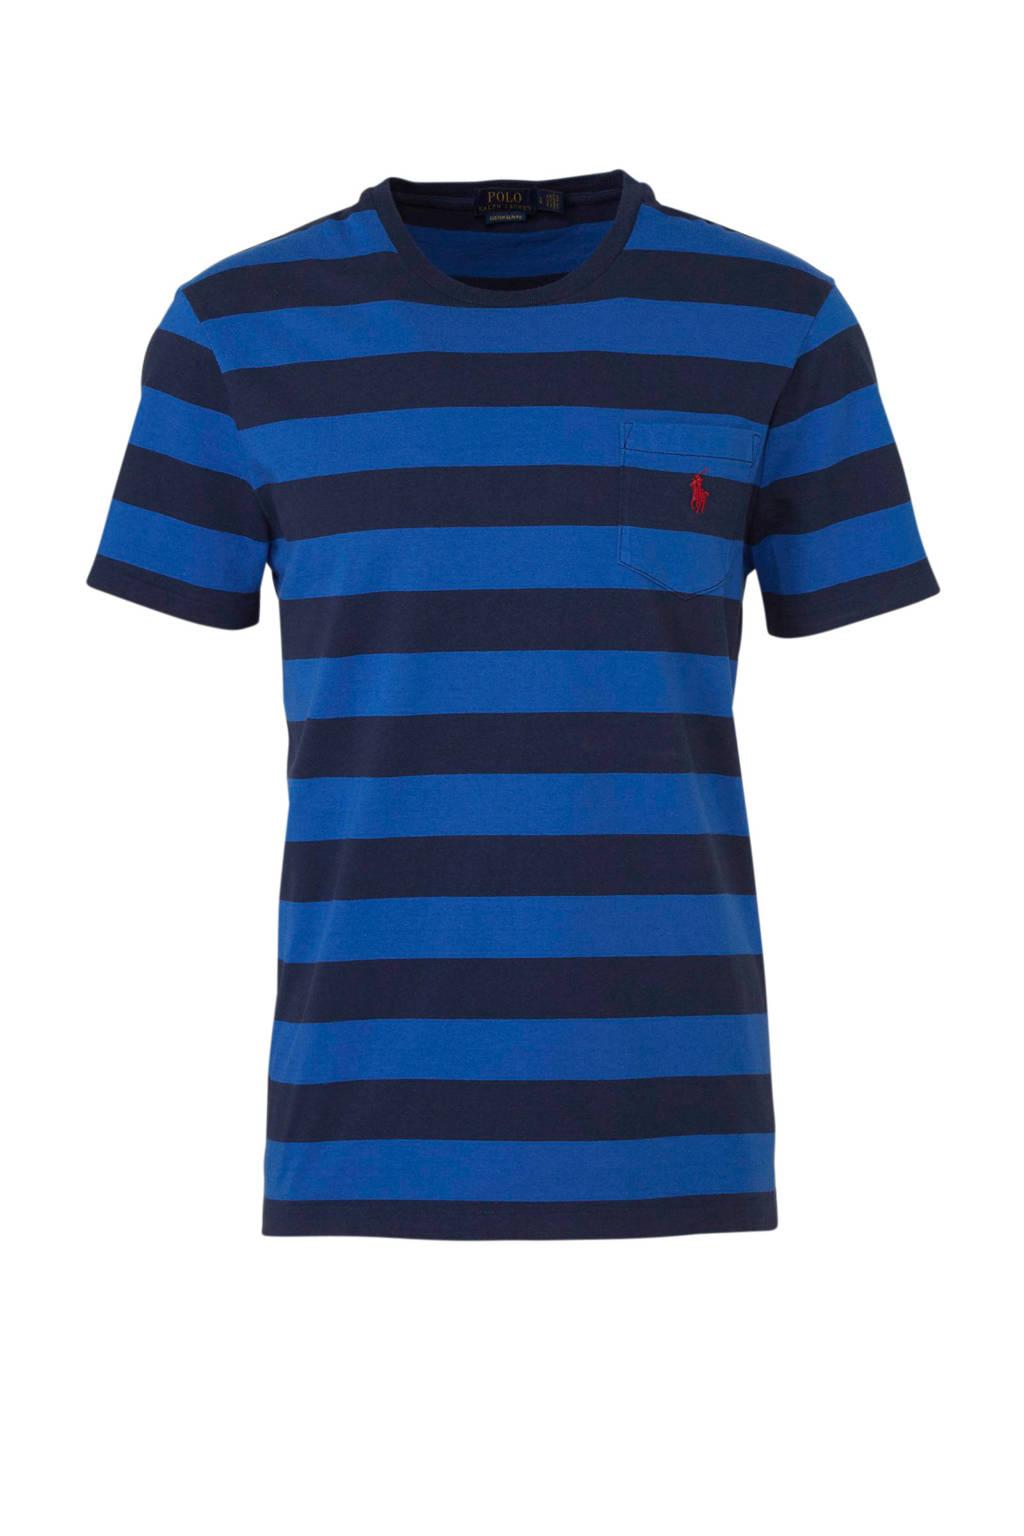 POLO Ralph Lauren gestreept T-shirt blauw, Blauw